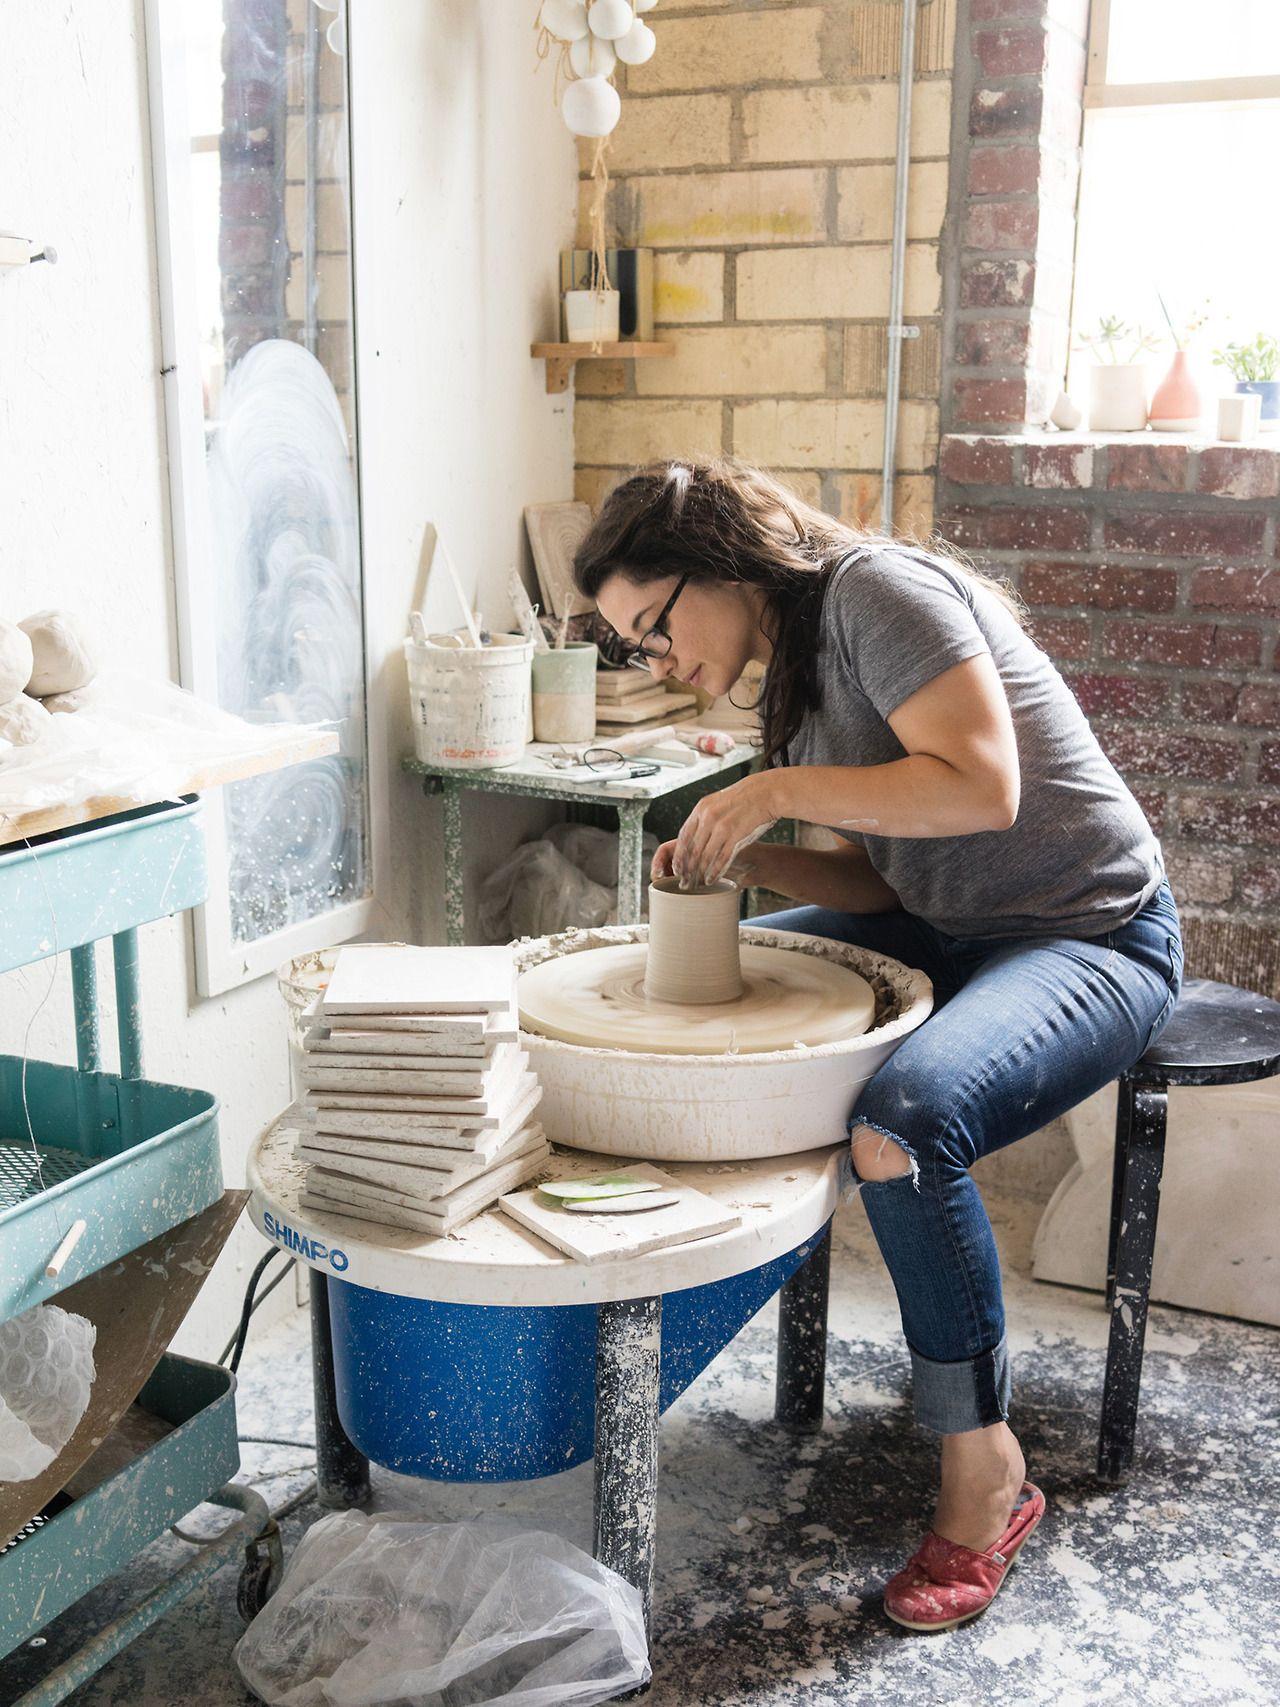 Cabinology Paper Clay Ceramics Memphis Tn Clay Ceramics Thrown Pottery Ceramic Studio